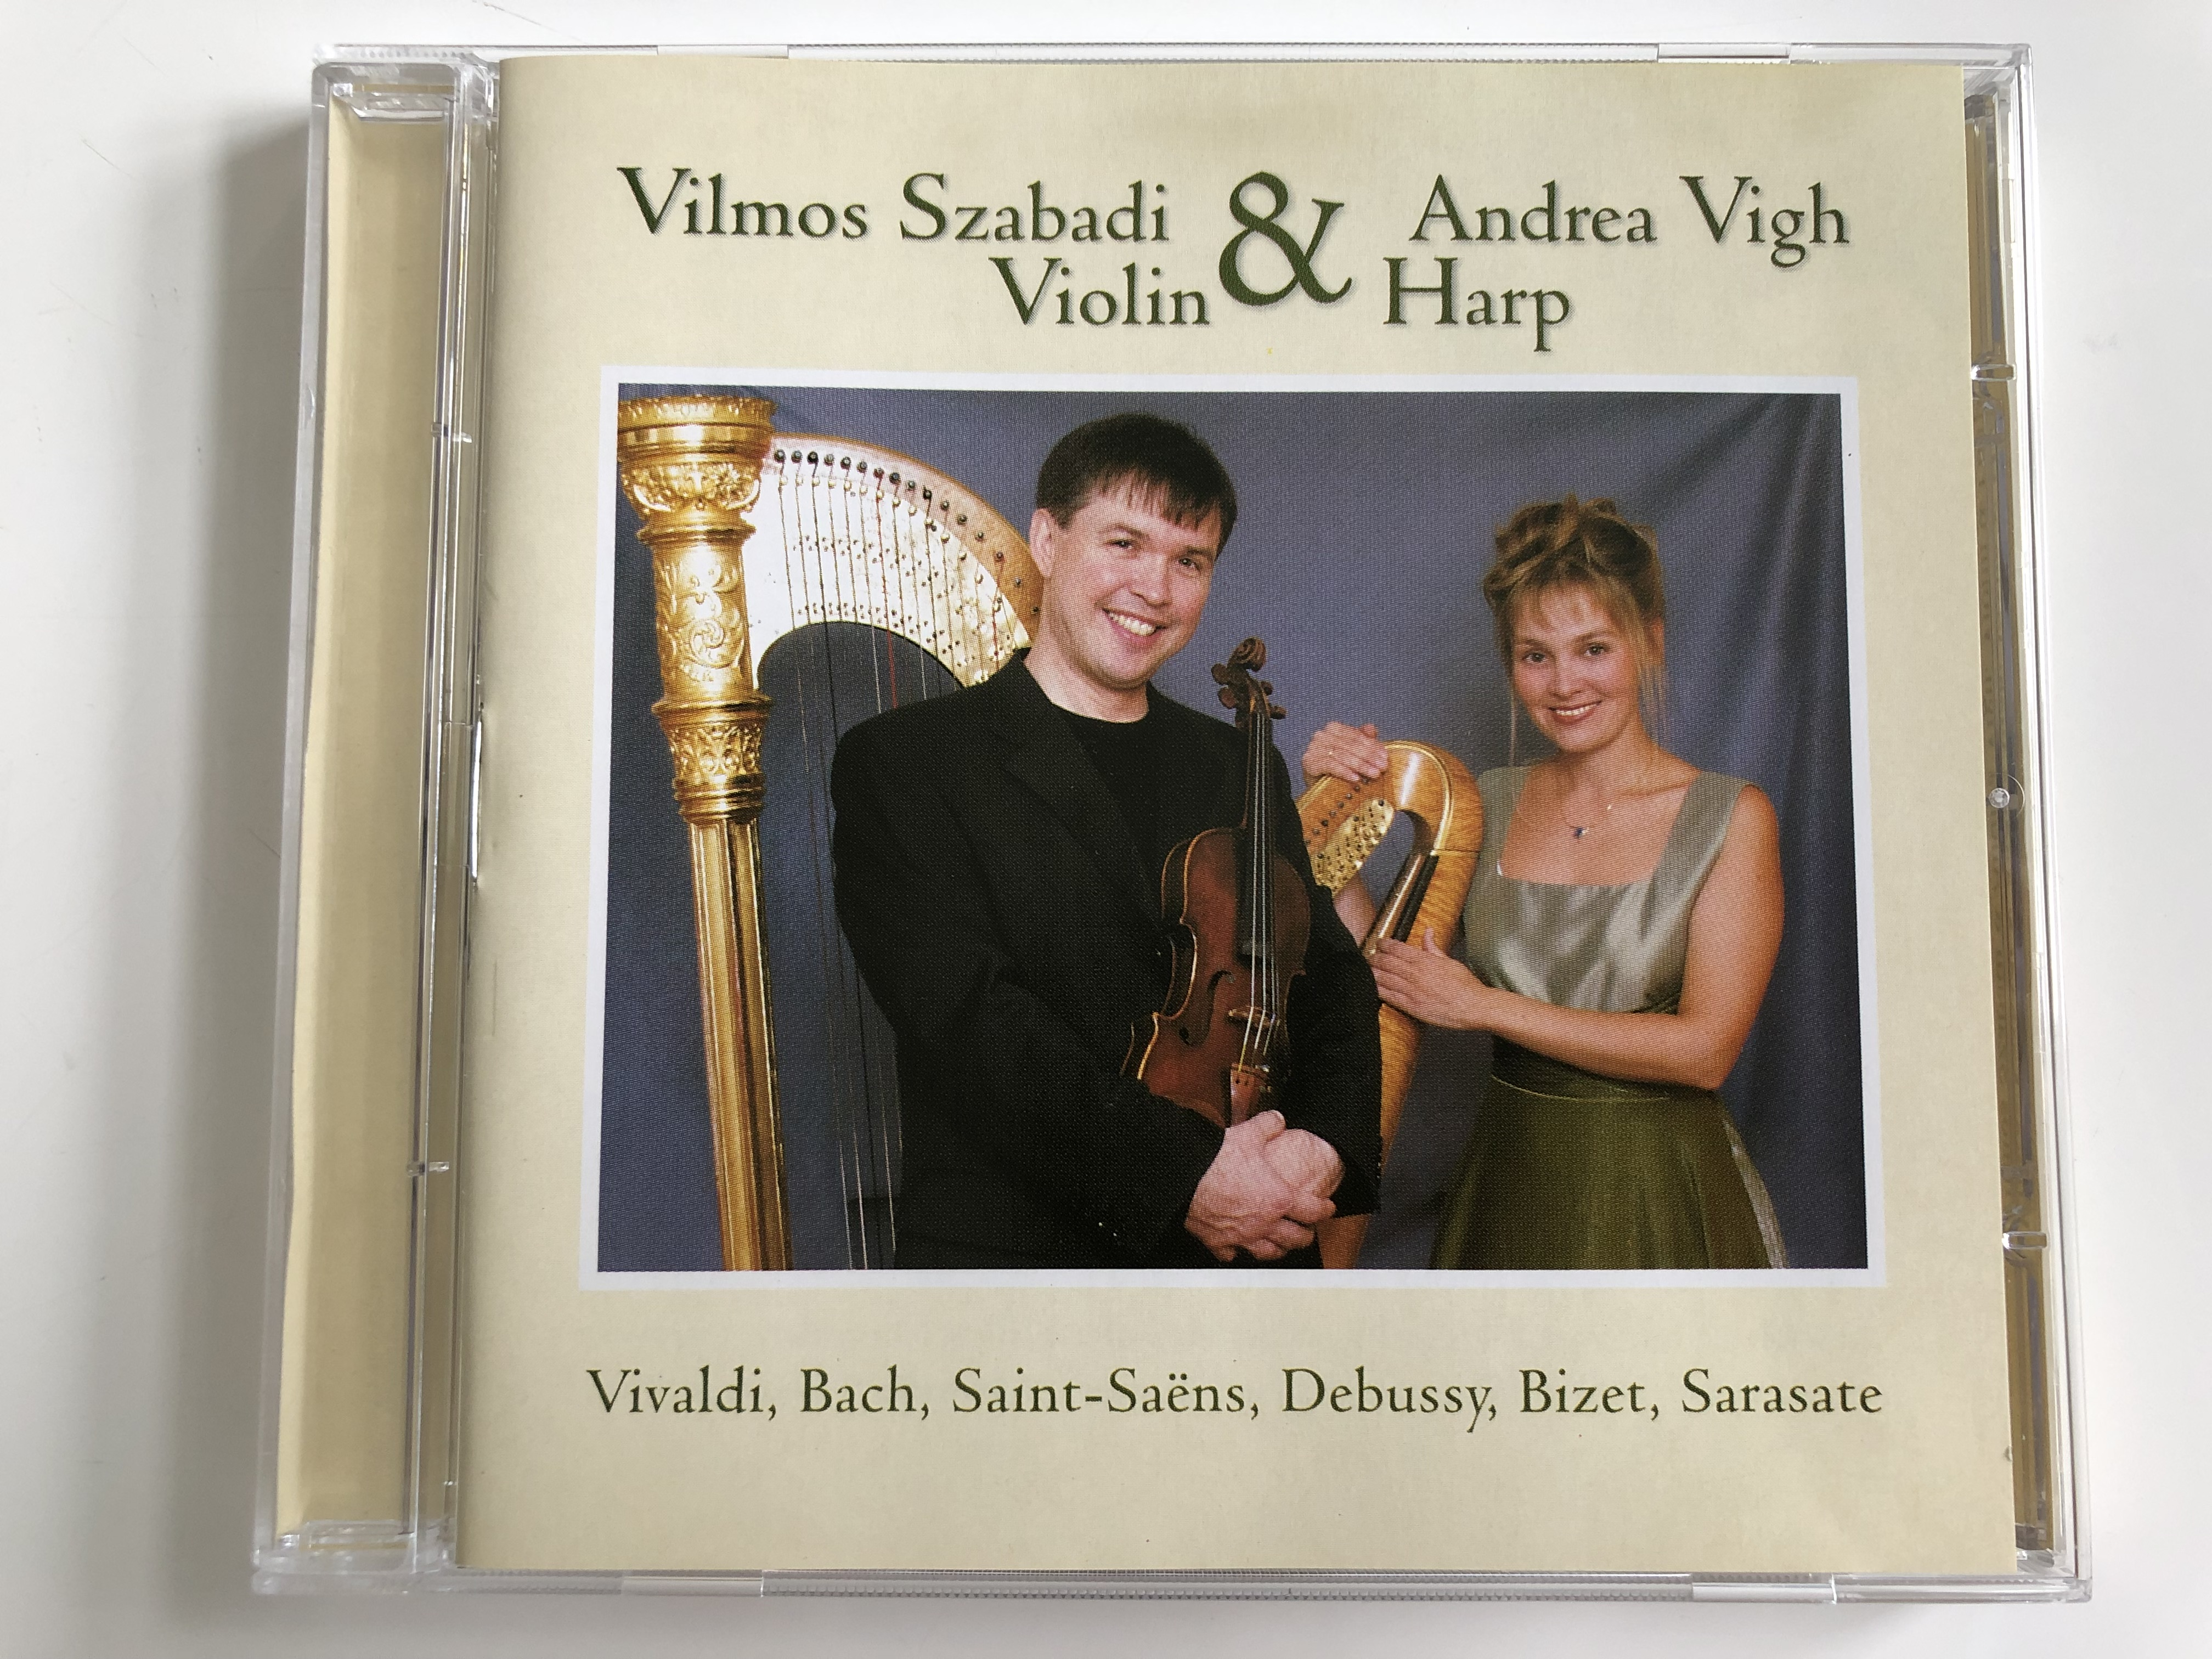 vilmos-szabadi-violin-andrea-vigh-harp-vivaldi-bach-saint-saens-debussy-bizet-sarasate-jakobi-koncert-kft.-audio-cd-2003-jk-k-2003-1-.jpg